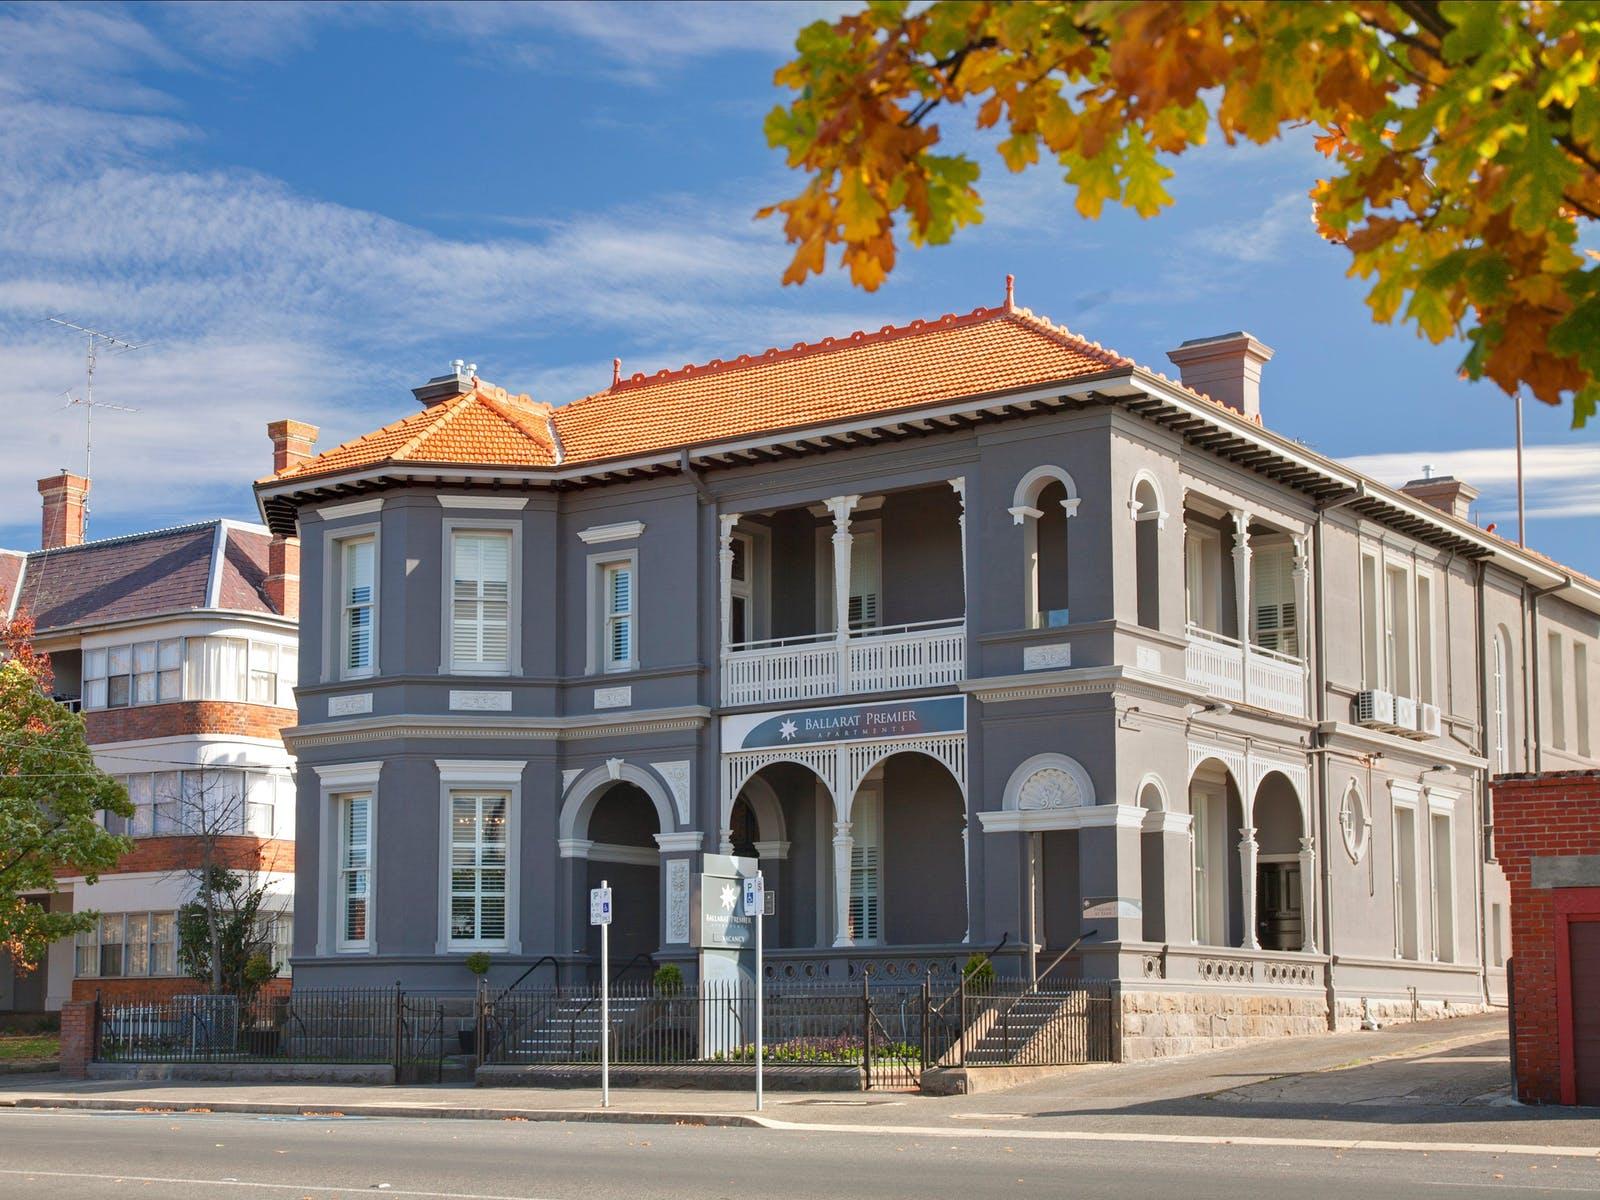 Ballarat Premier Apartfments